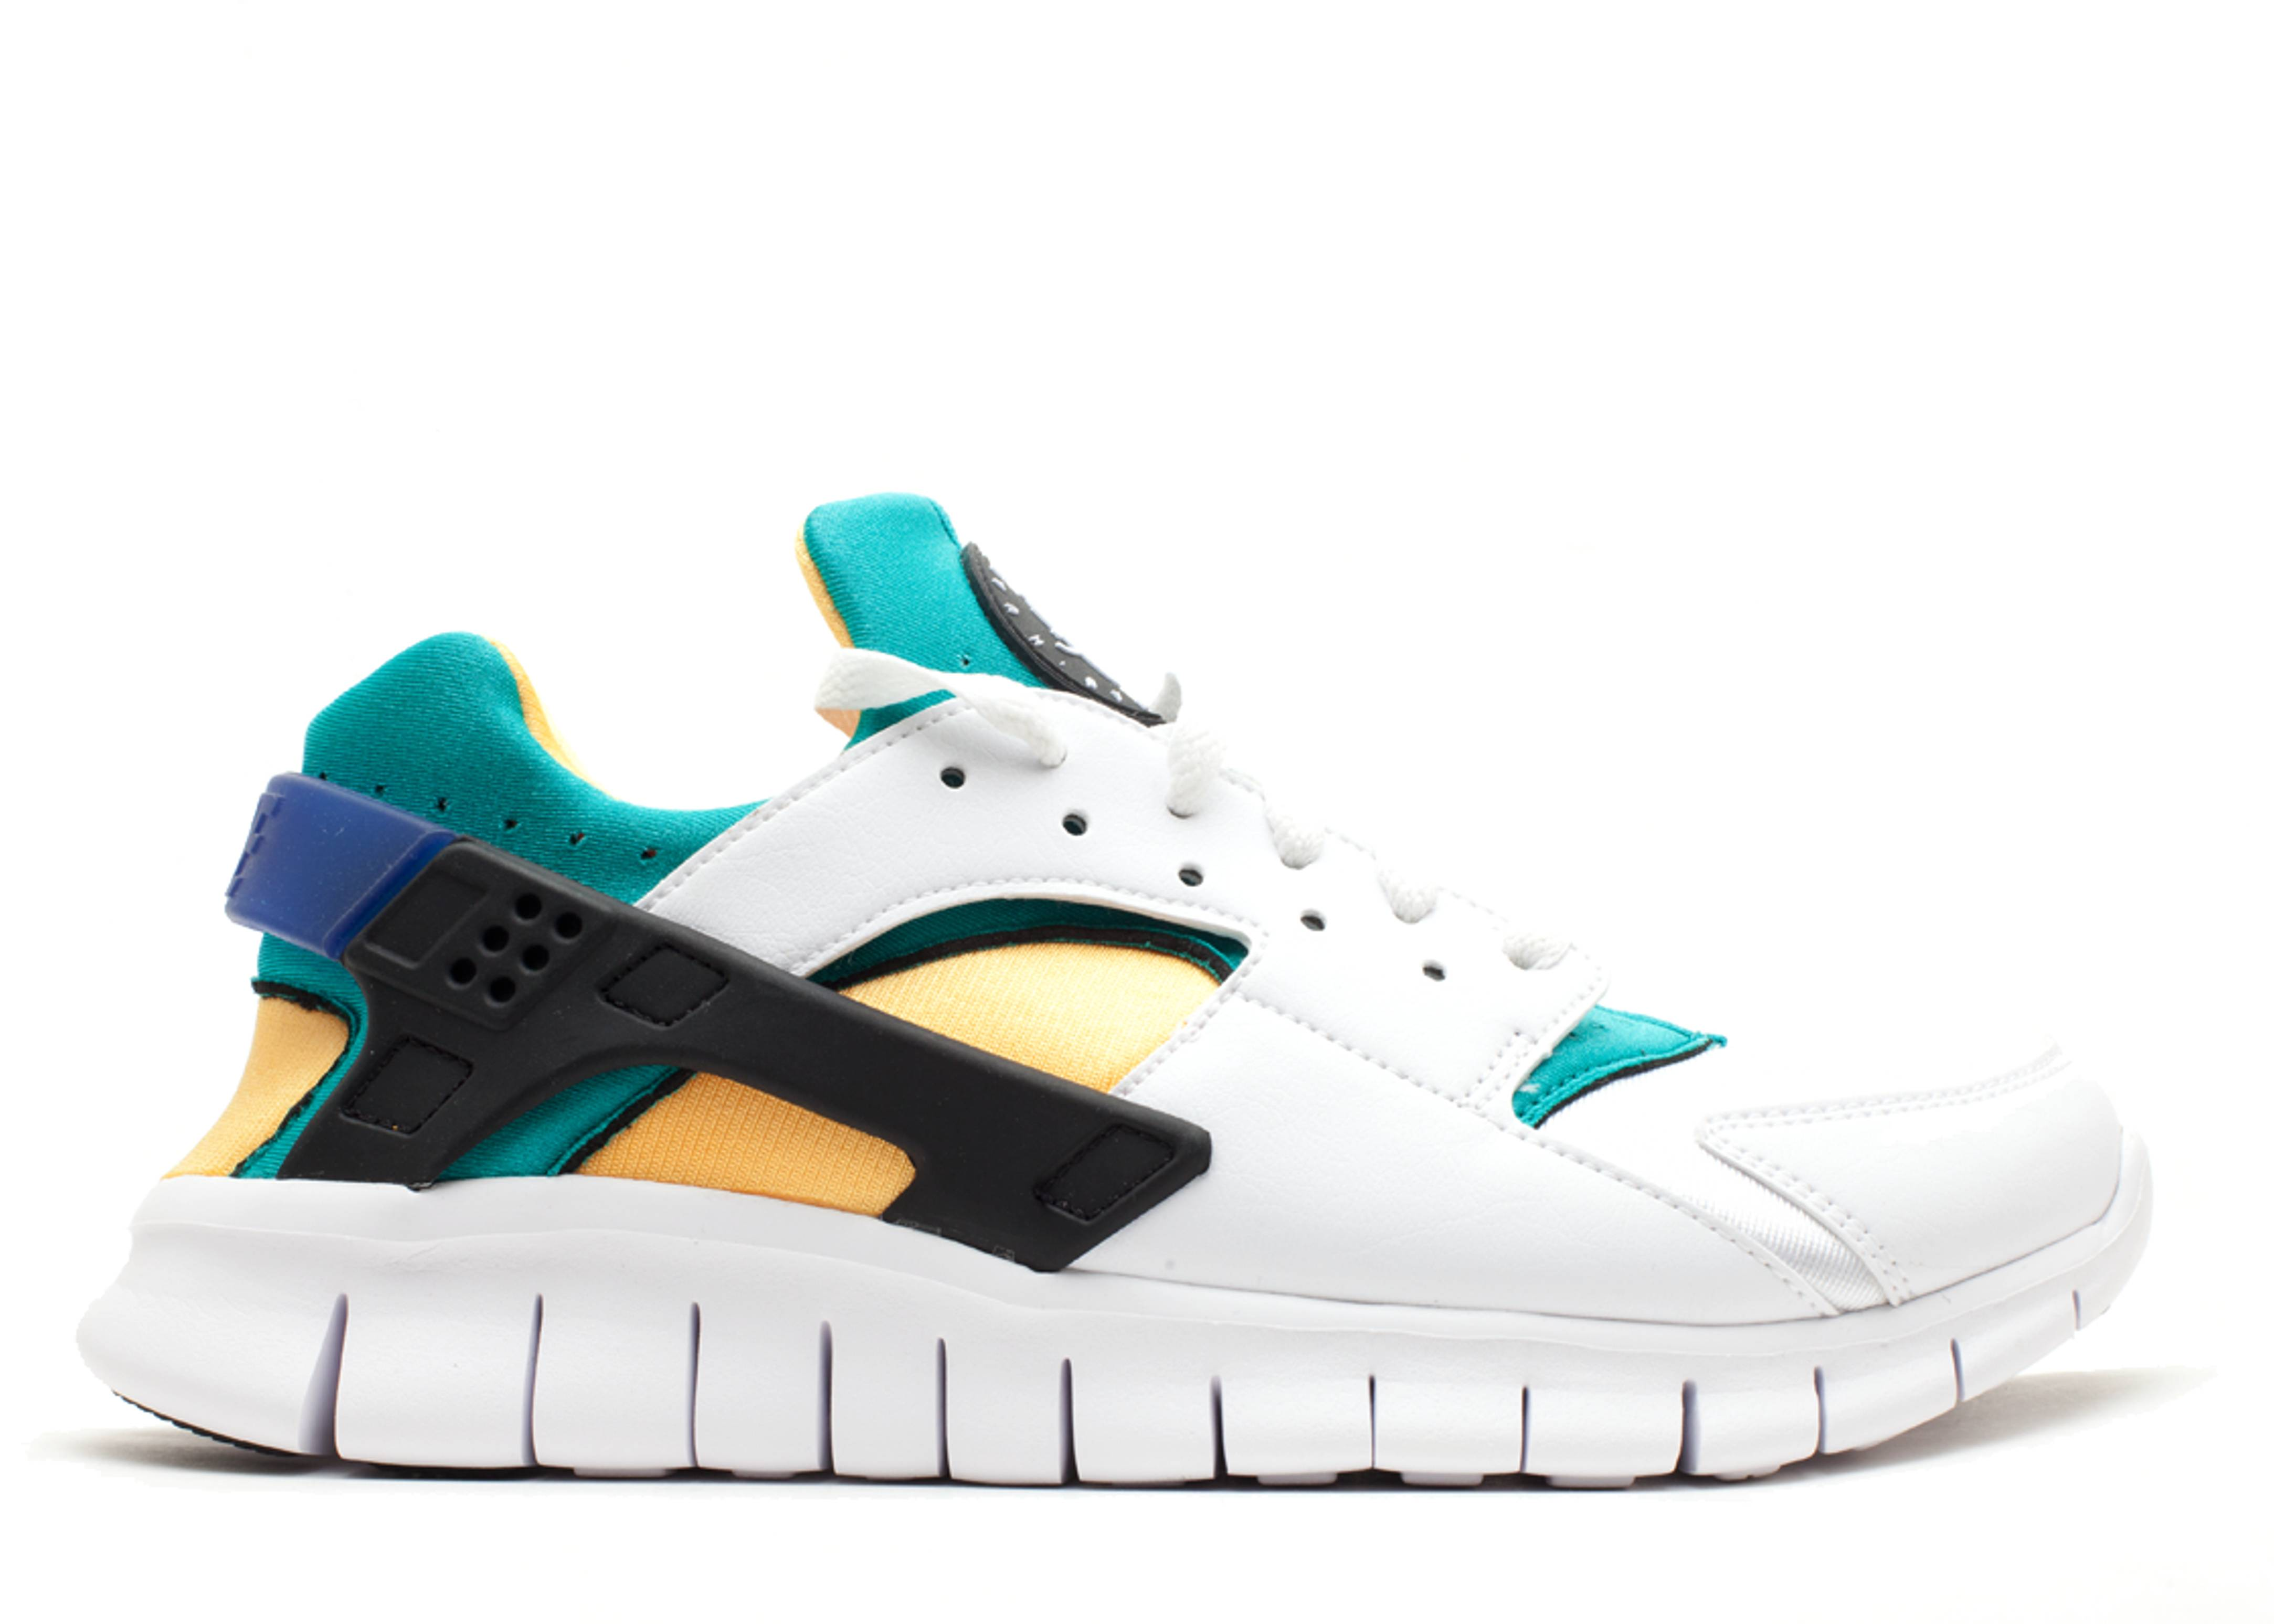 quality design 72ade 2b10c Huarache Free 2012 Qs - Nike - dont use - whitewhite-blue emerald-resin   Flight Club